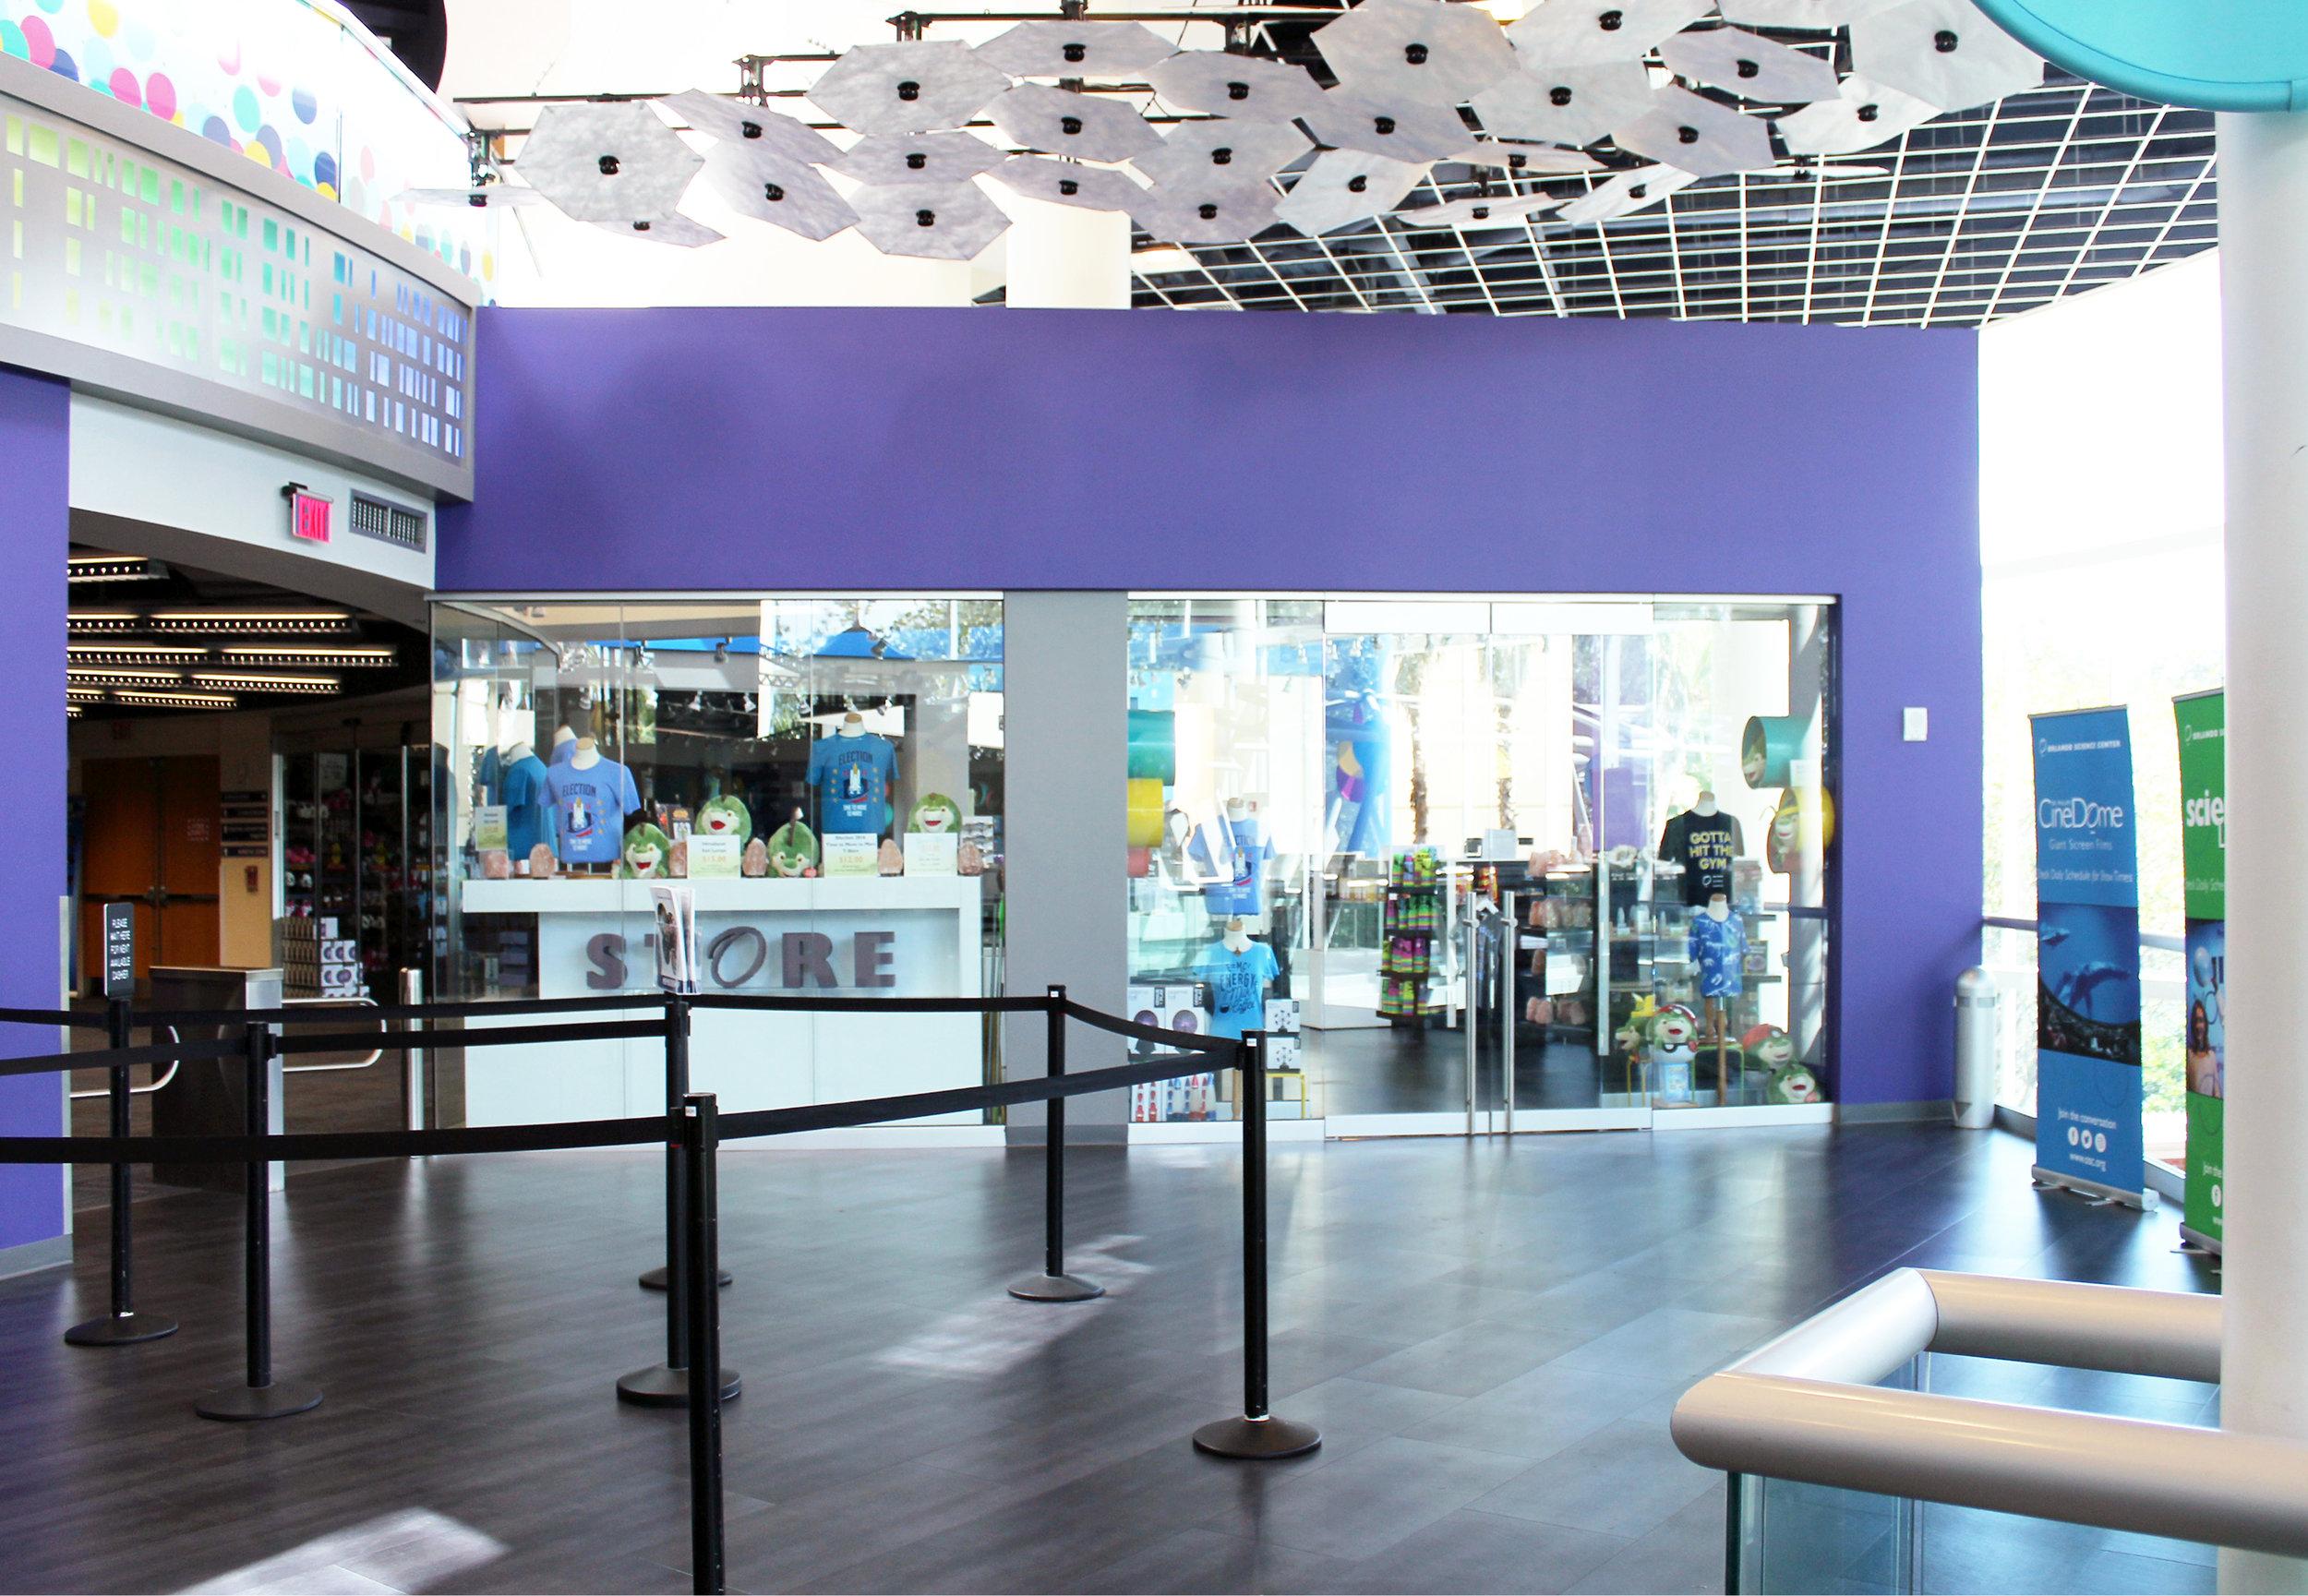 Orlando Science Center - Store